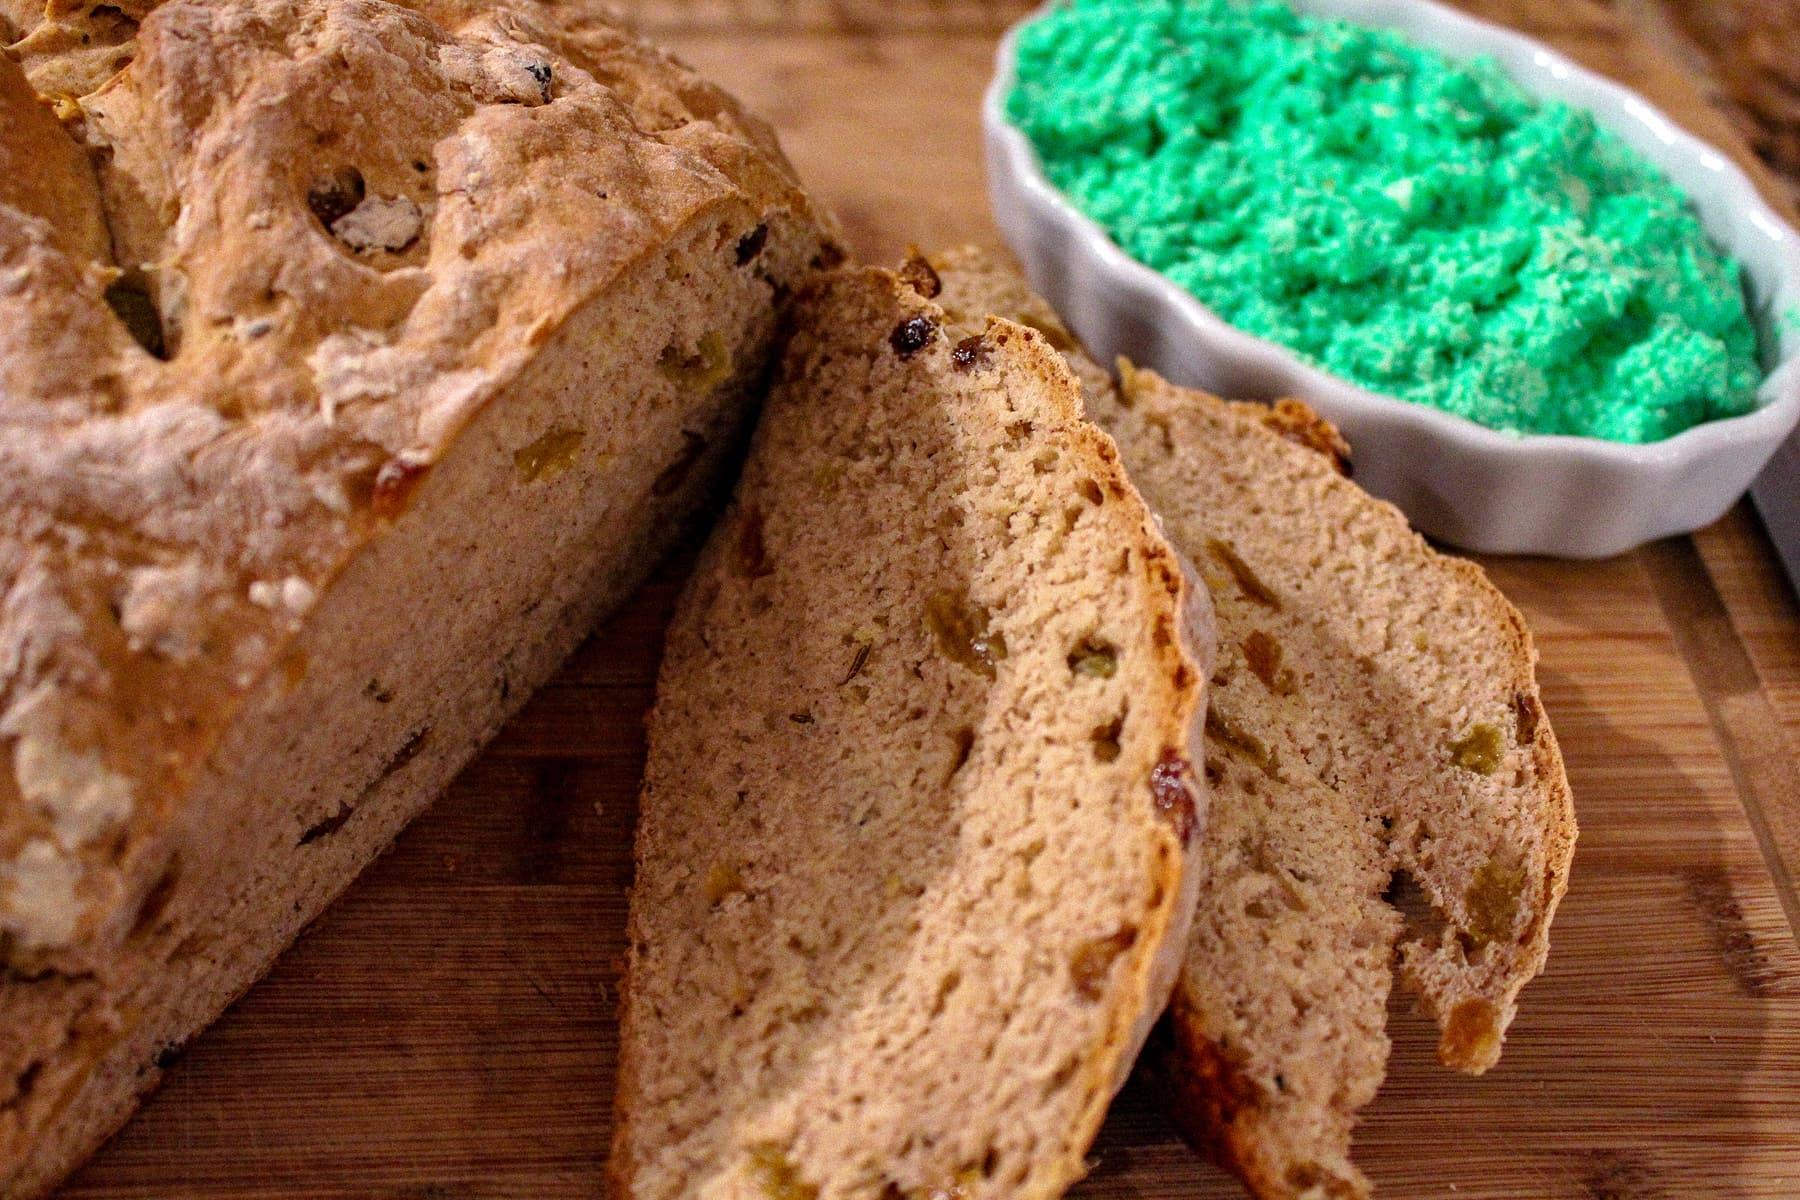 Irish soda bread clipart transparent graphic freeuse Mom\'s Irish Soda Bread with Tangy Green Butter graphic freeuse